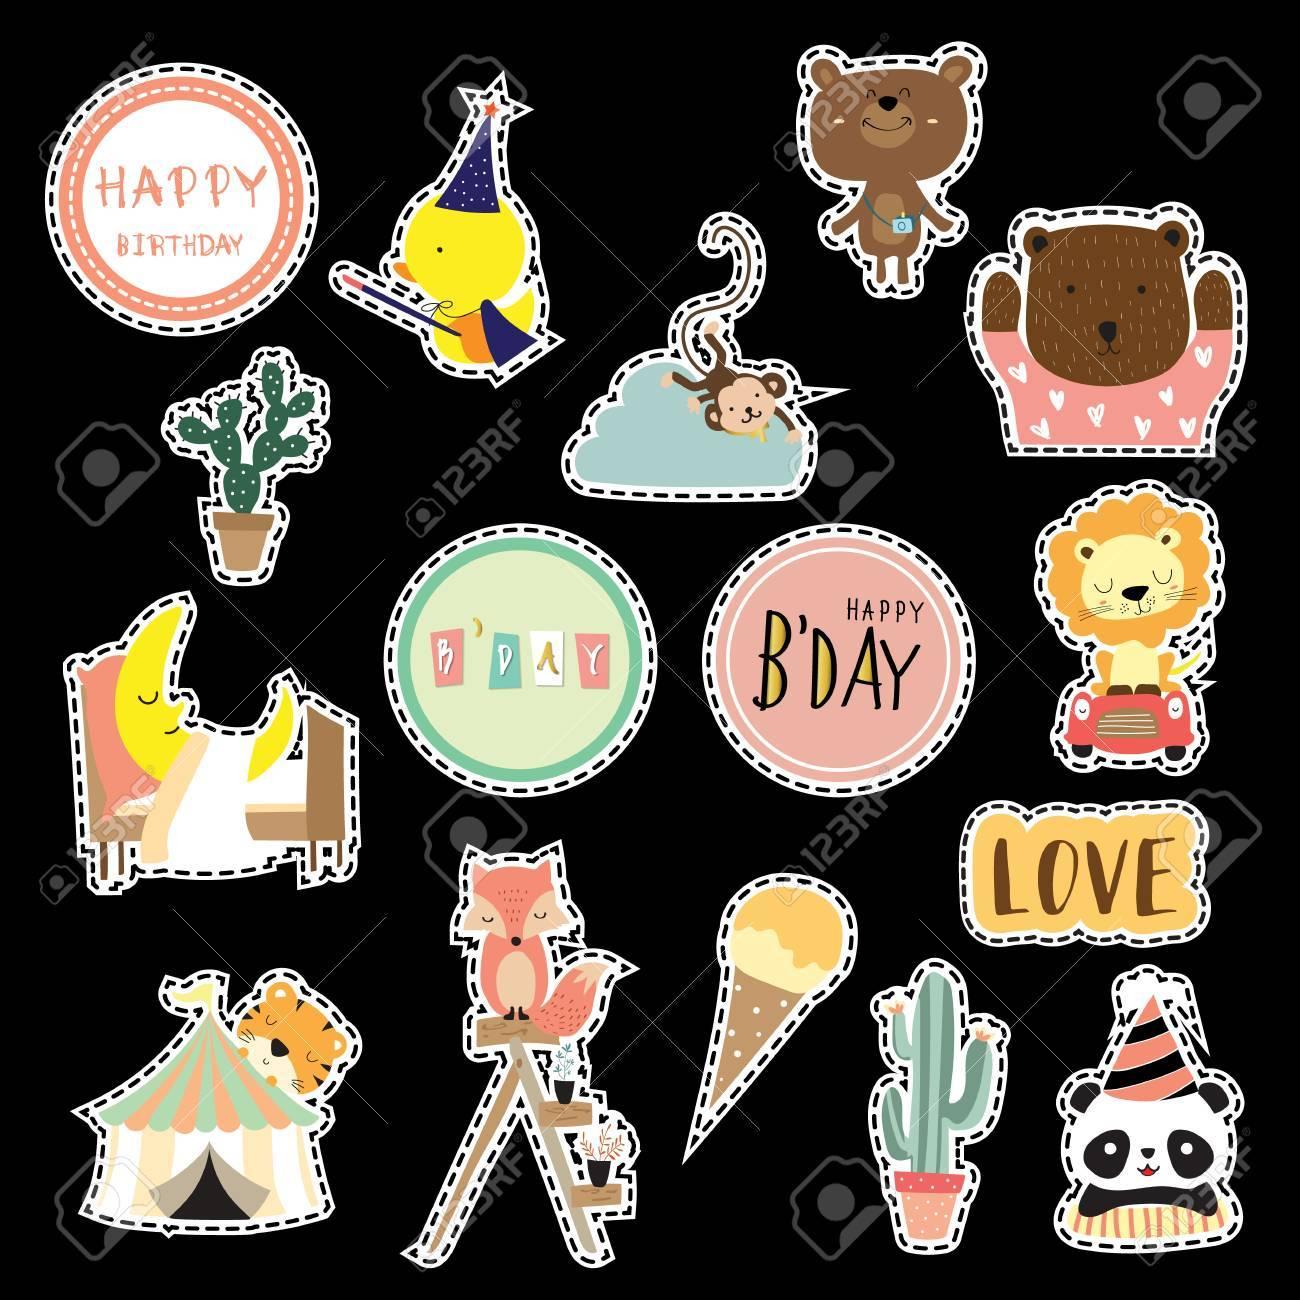 Cartoon Icon Collection With Duck Fox Panda Bear Cactus Tiger Lion